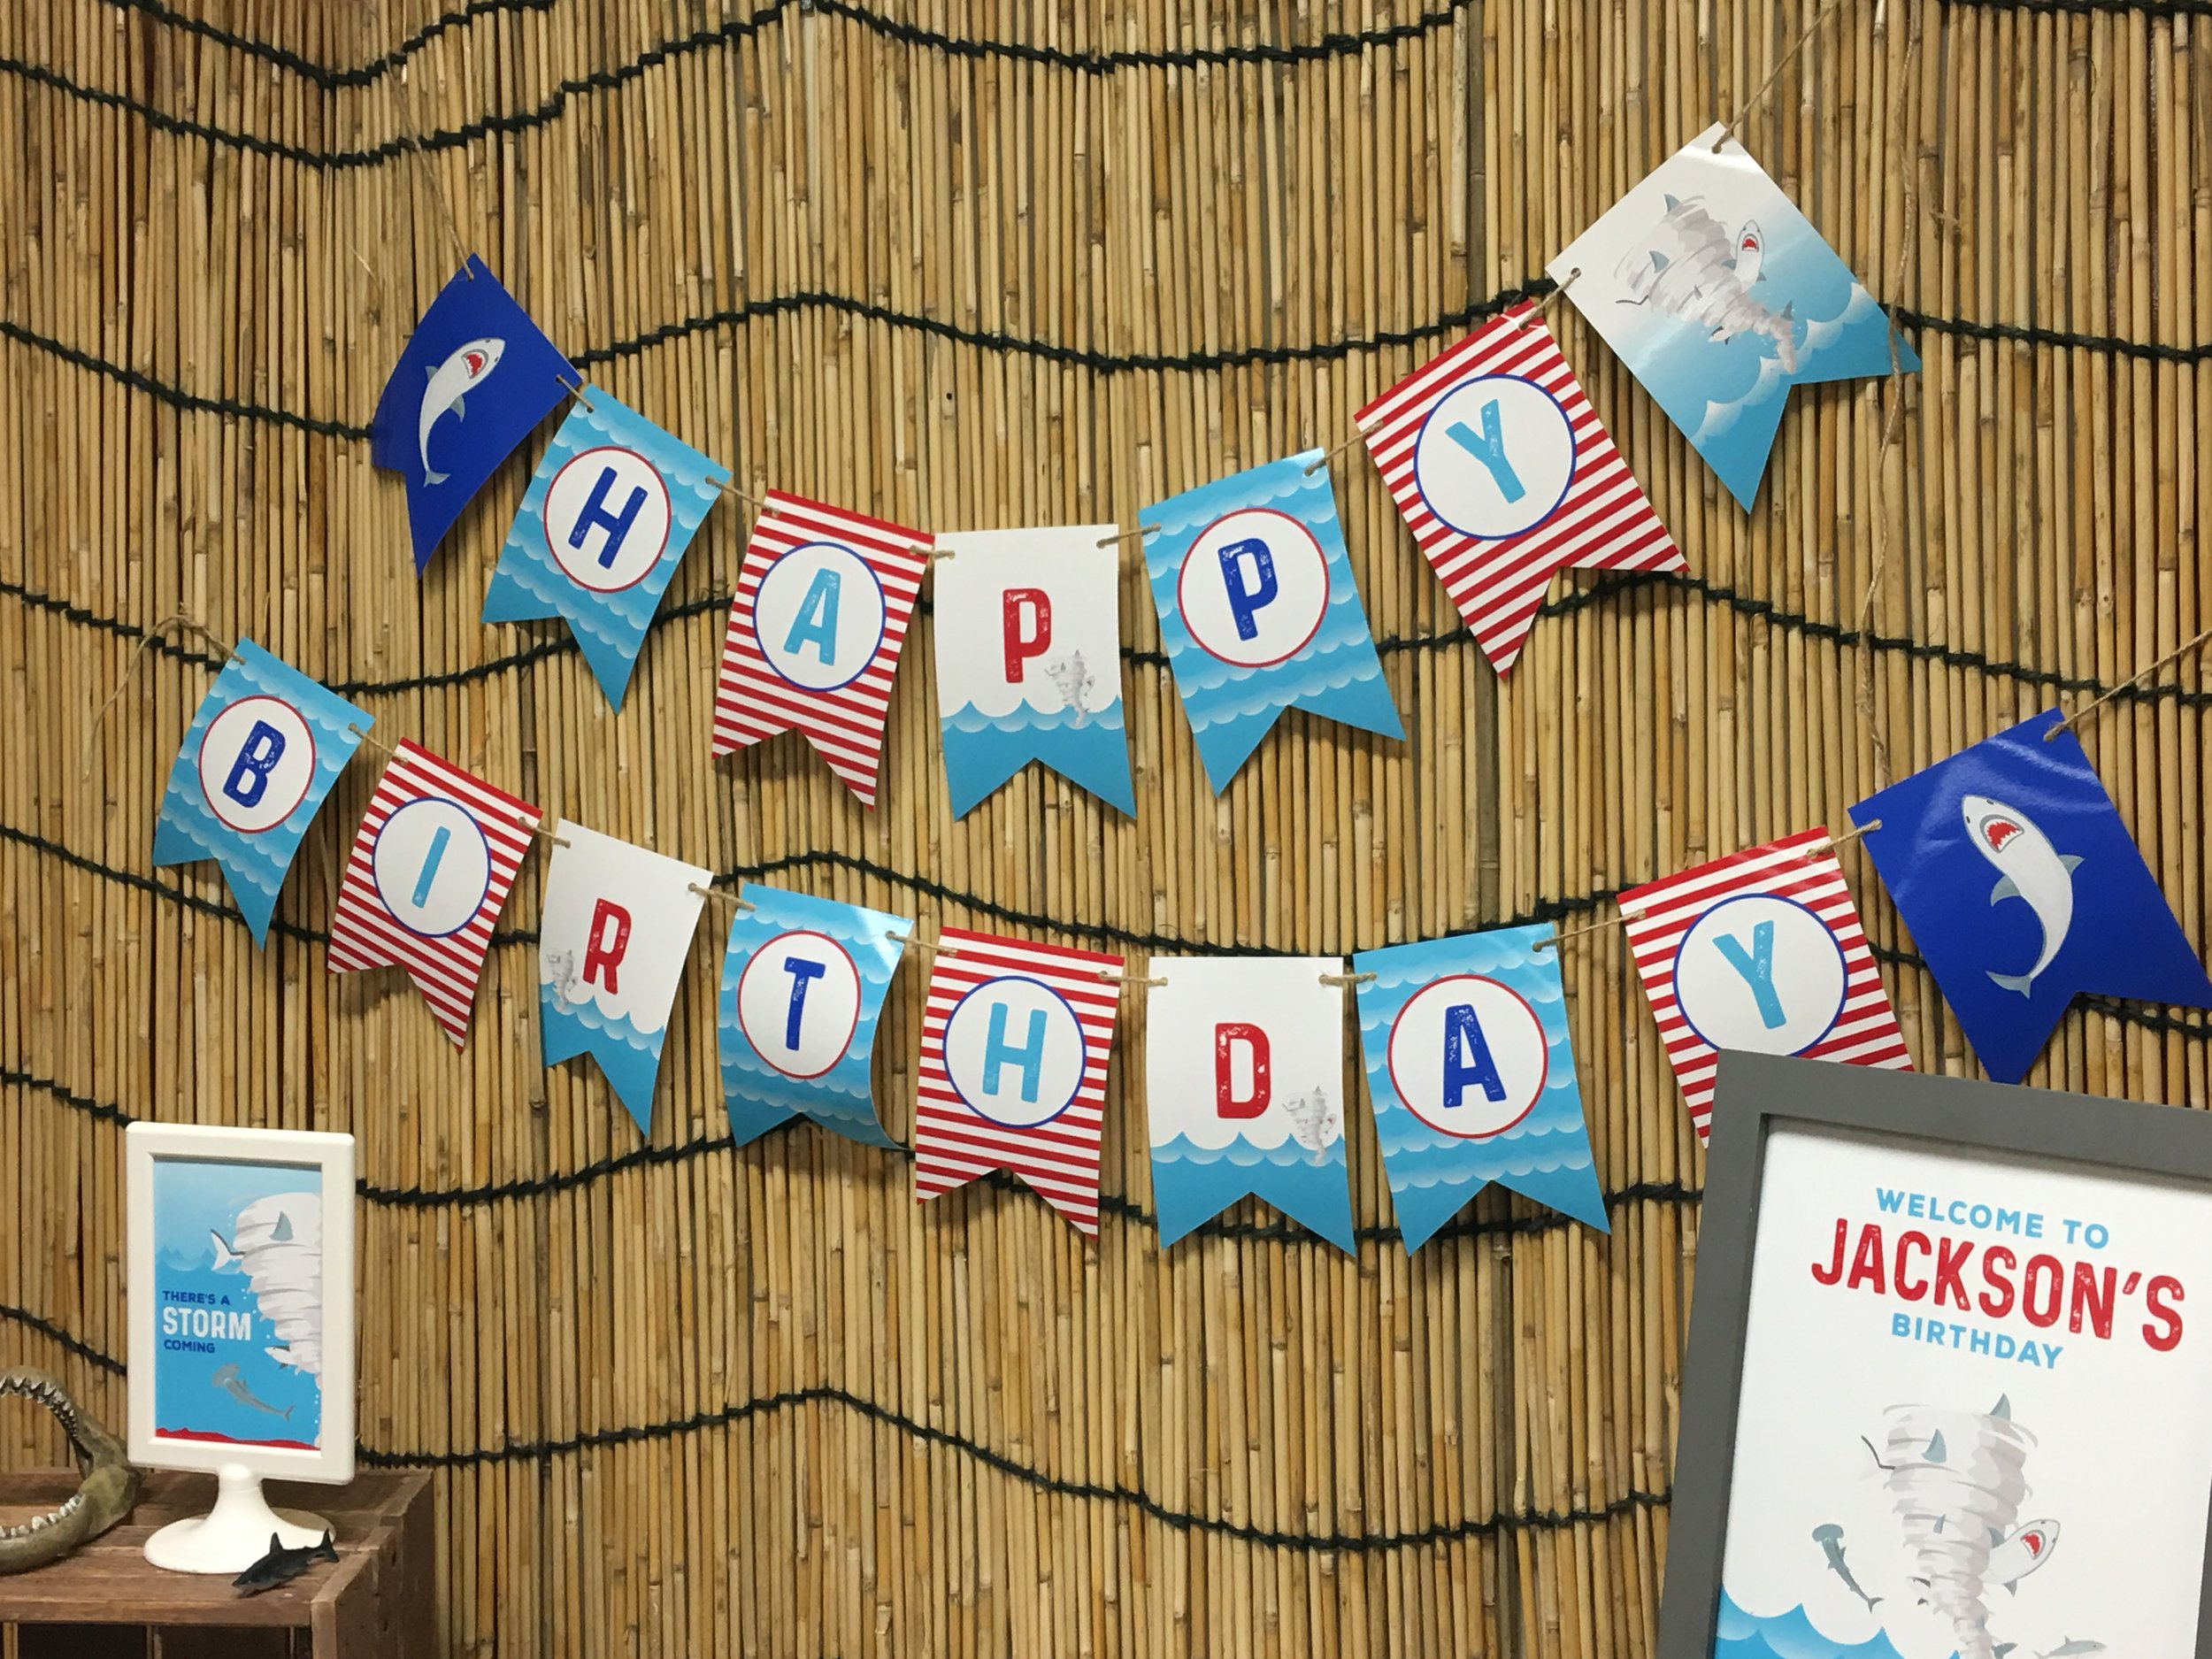 Sharknado themed birthday banner // mkkmdesigns